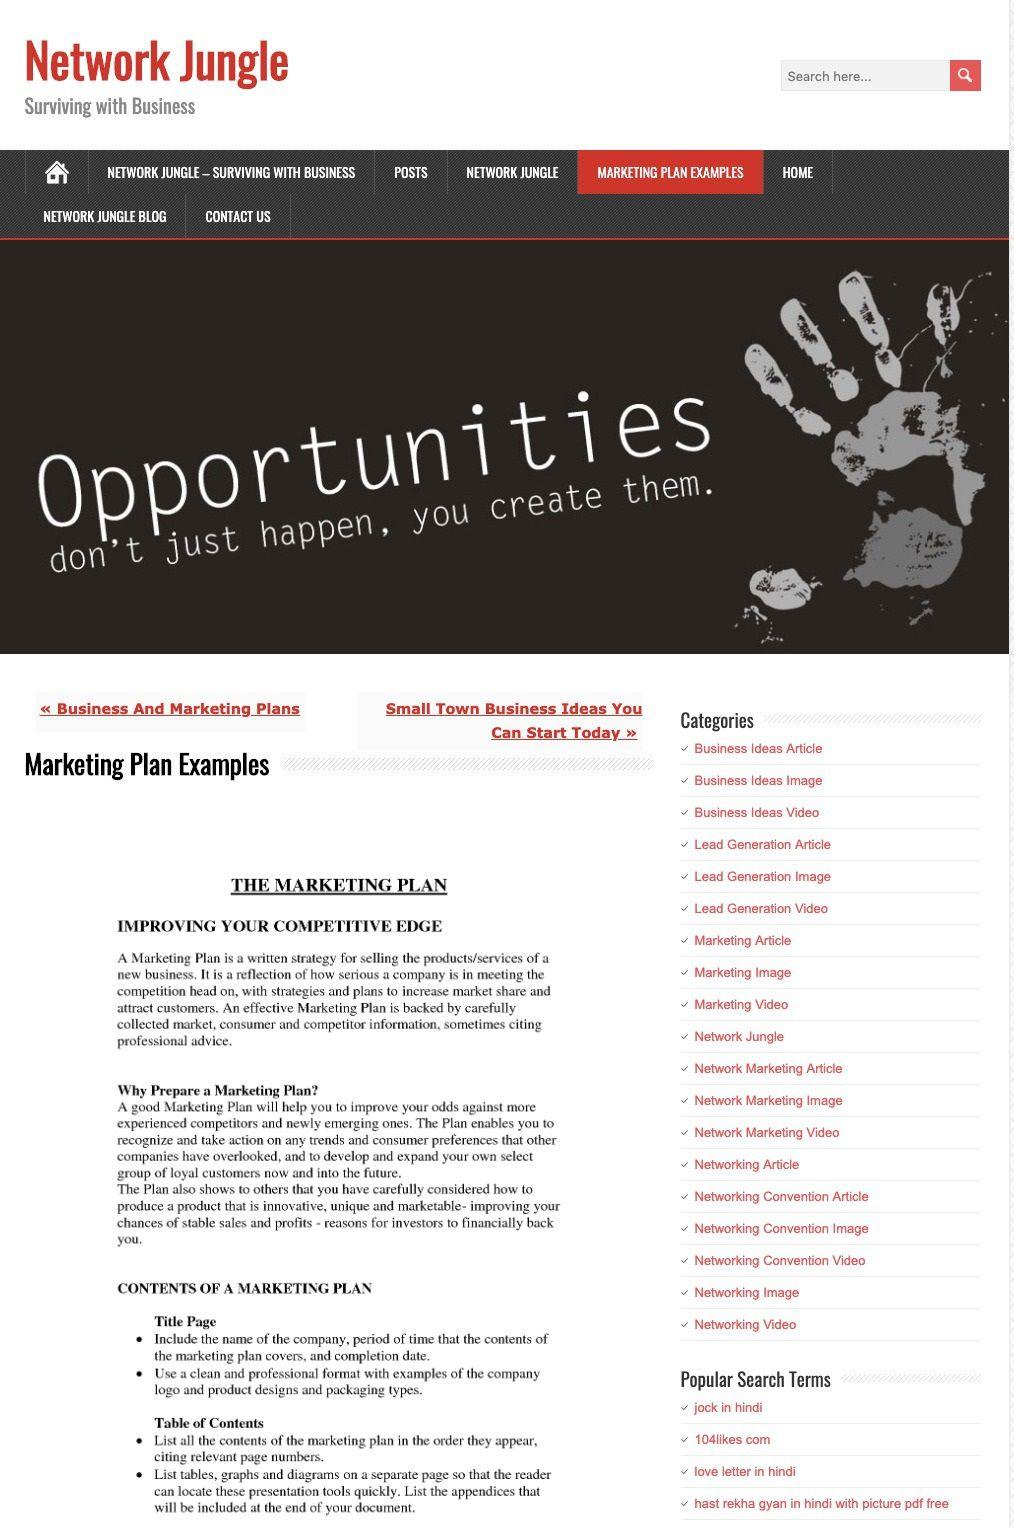 009 Sensational Digital Marketing Plan Example Pdf Image  Free Template Busines SampleFull